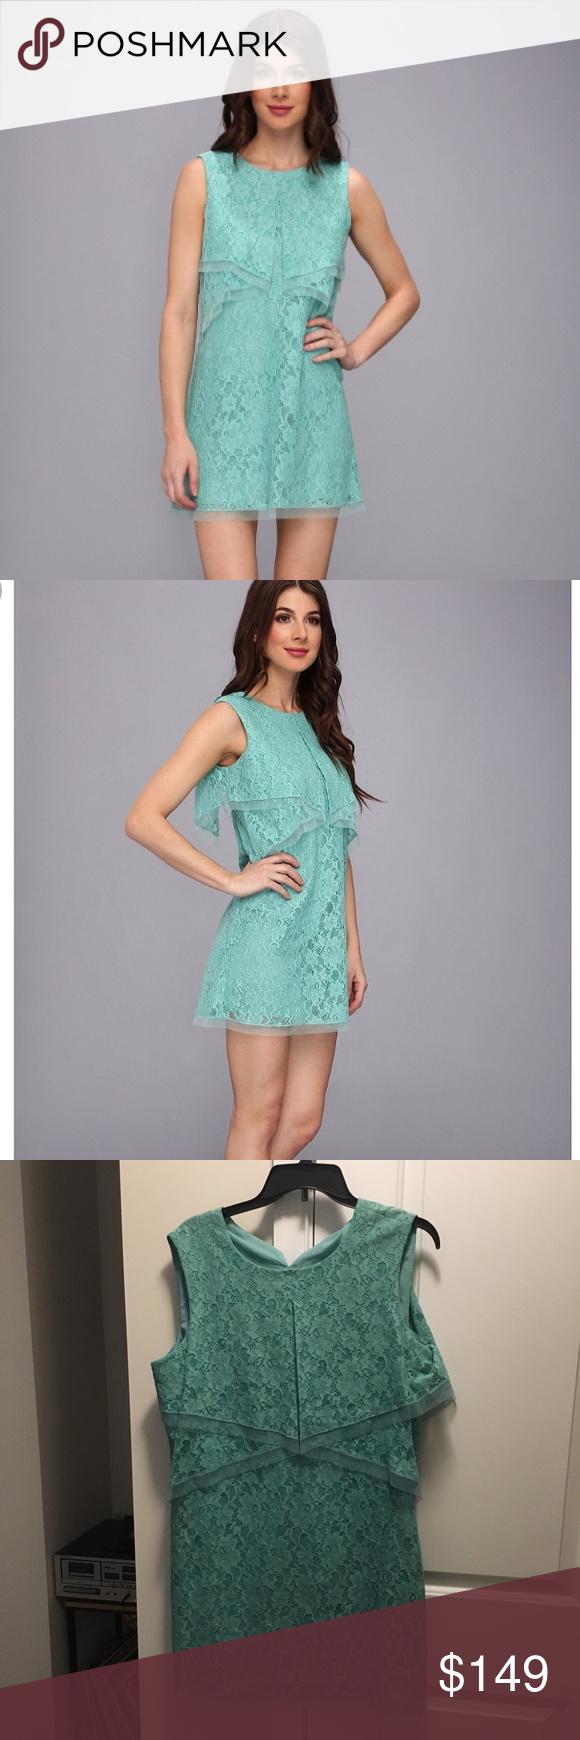 Bcbg aqua lace dress new w tags nwt beautiful lace and minis